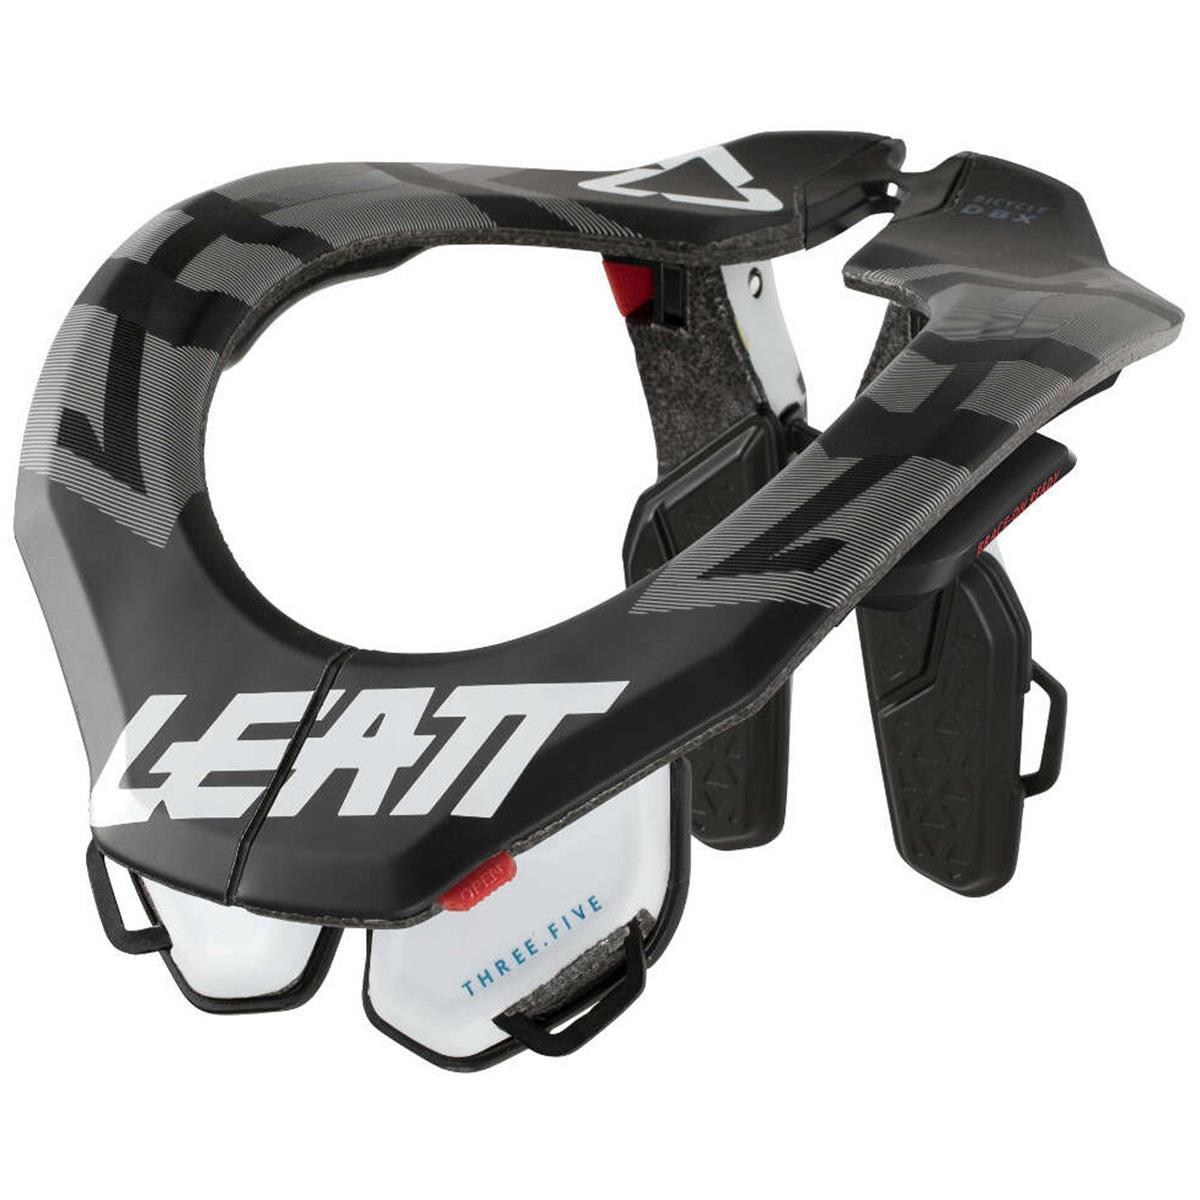 Leatt Youth DBX 3.5 Junior Bicycle Neck Brace-Black